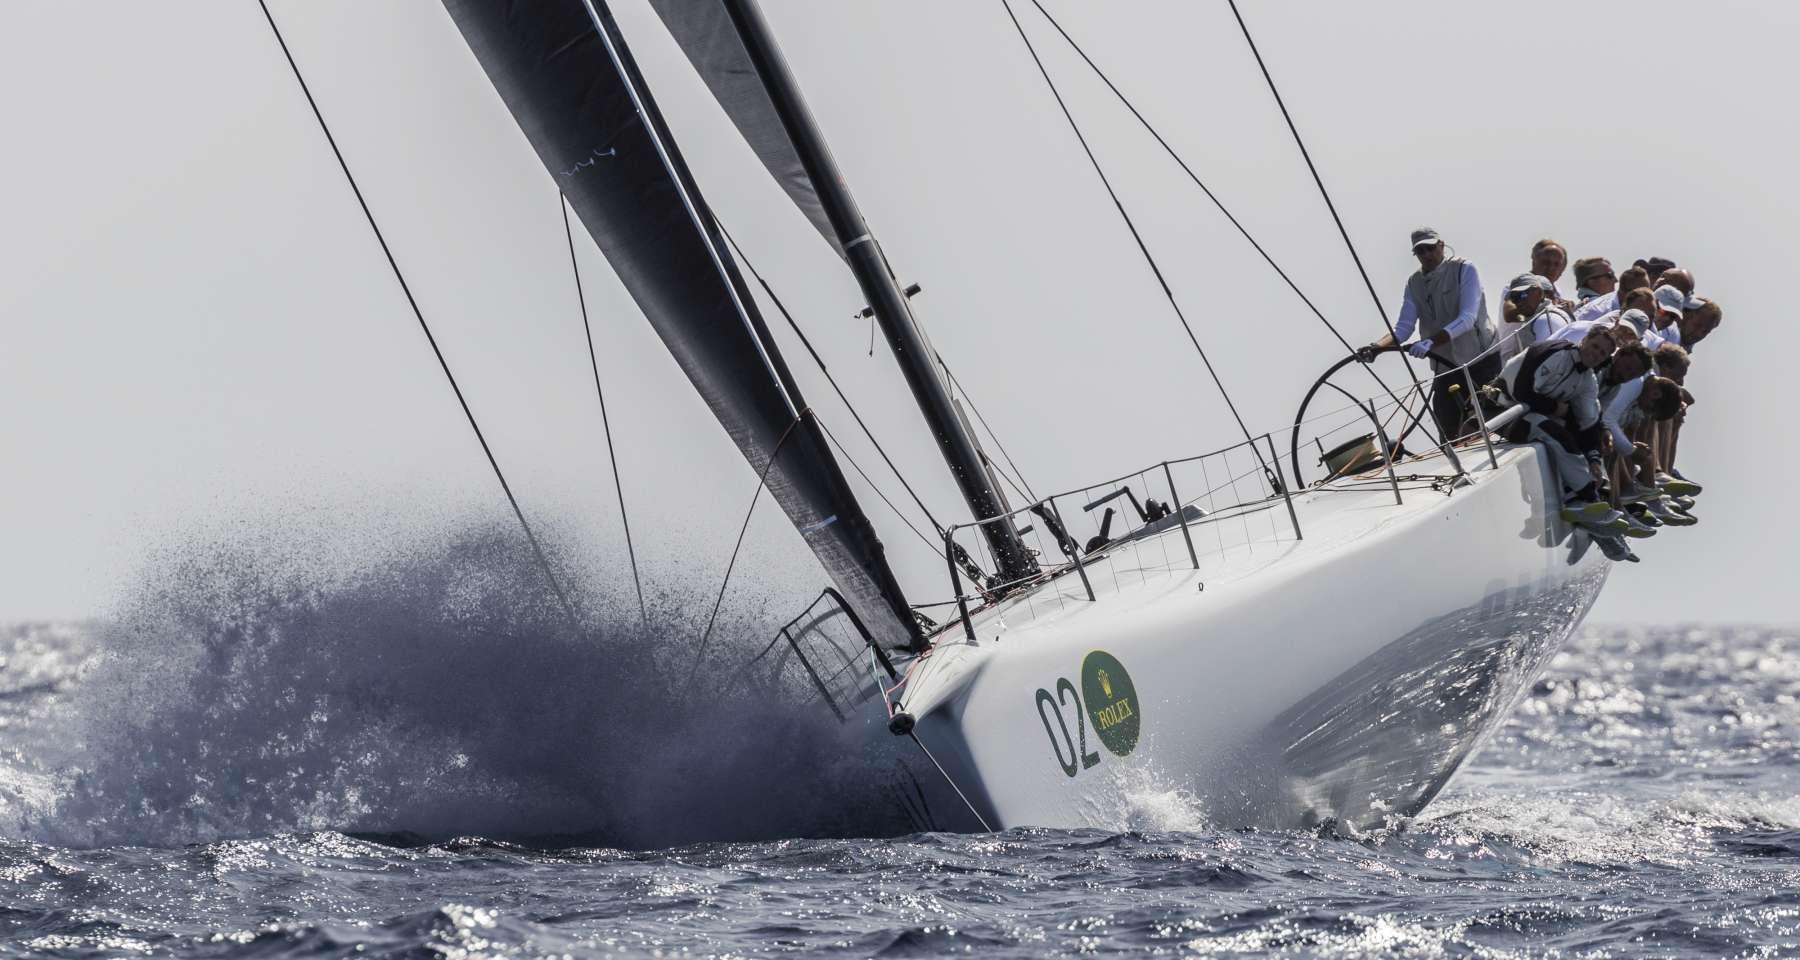 Maxi Yacht Rolex Cup 07 09 2017 Borlenghi 01